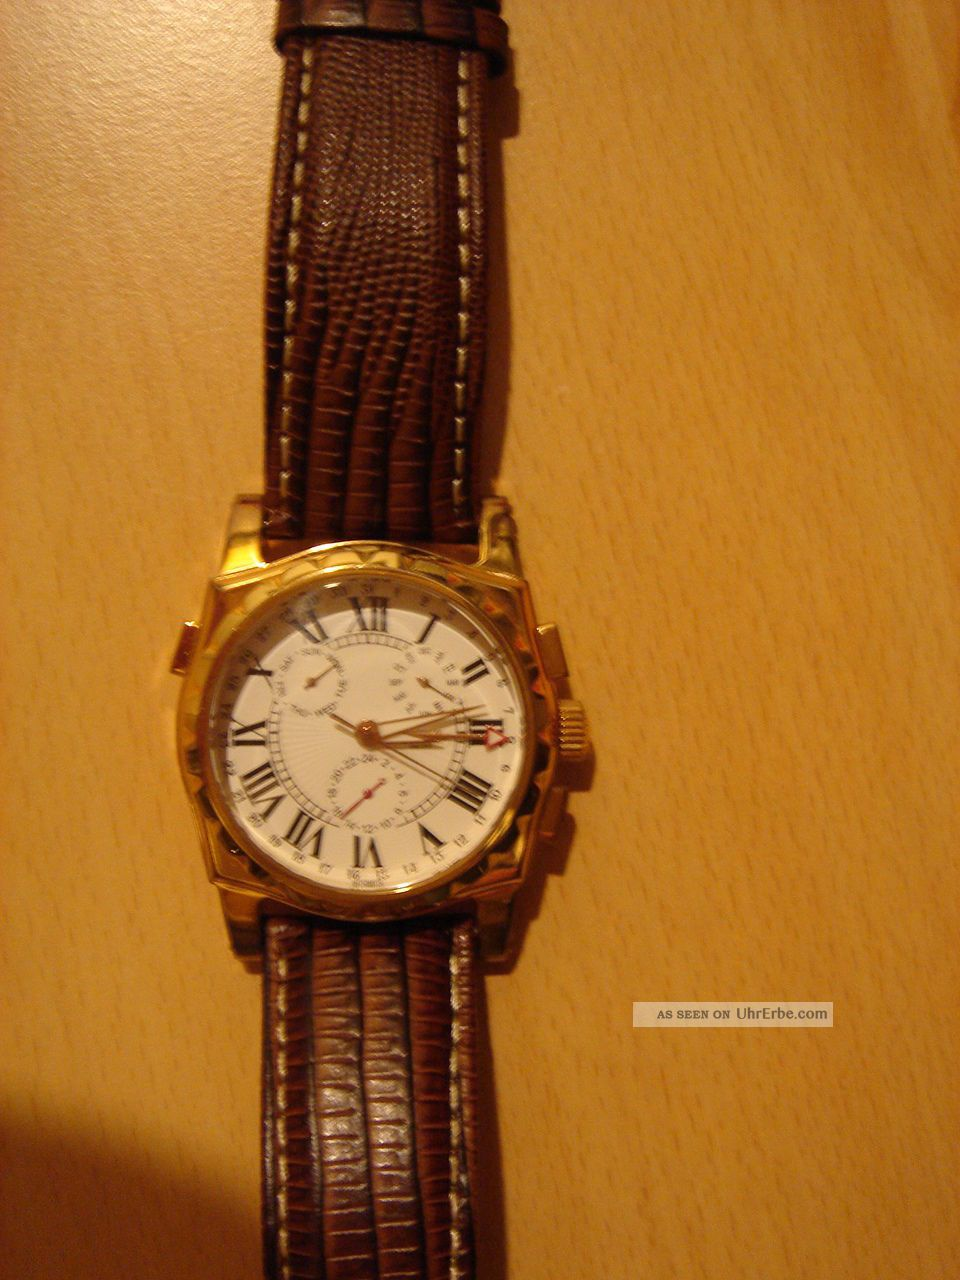 Herrenarmbanduhr Eichmüller Automatik Armbanduhren Bild